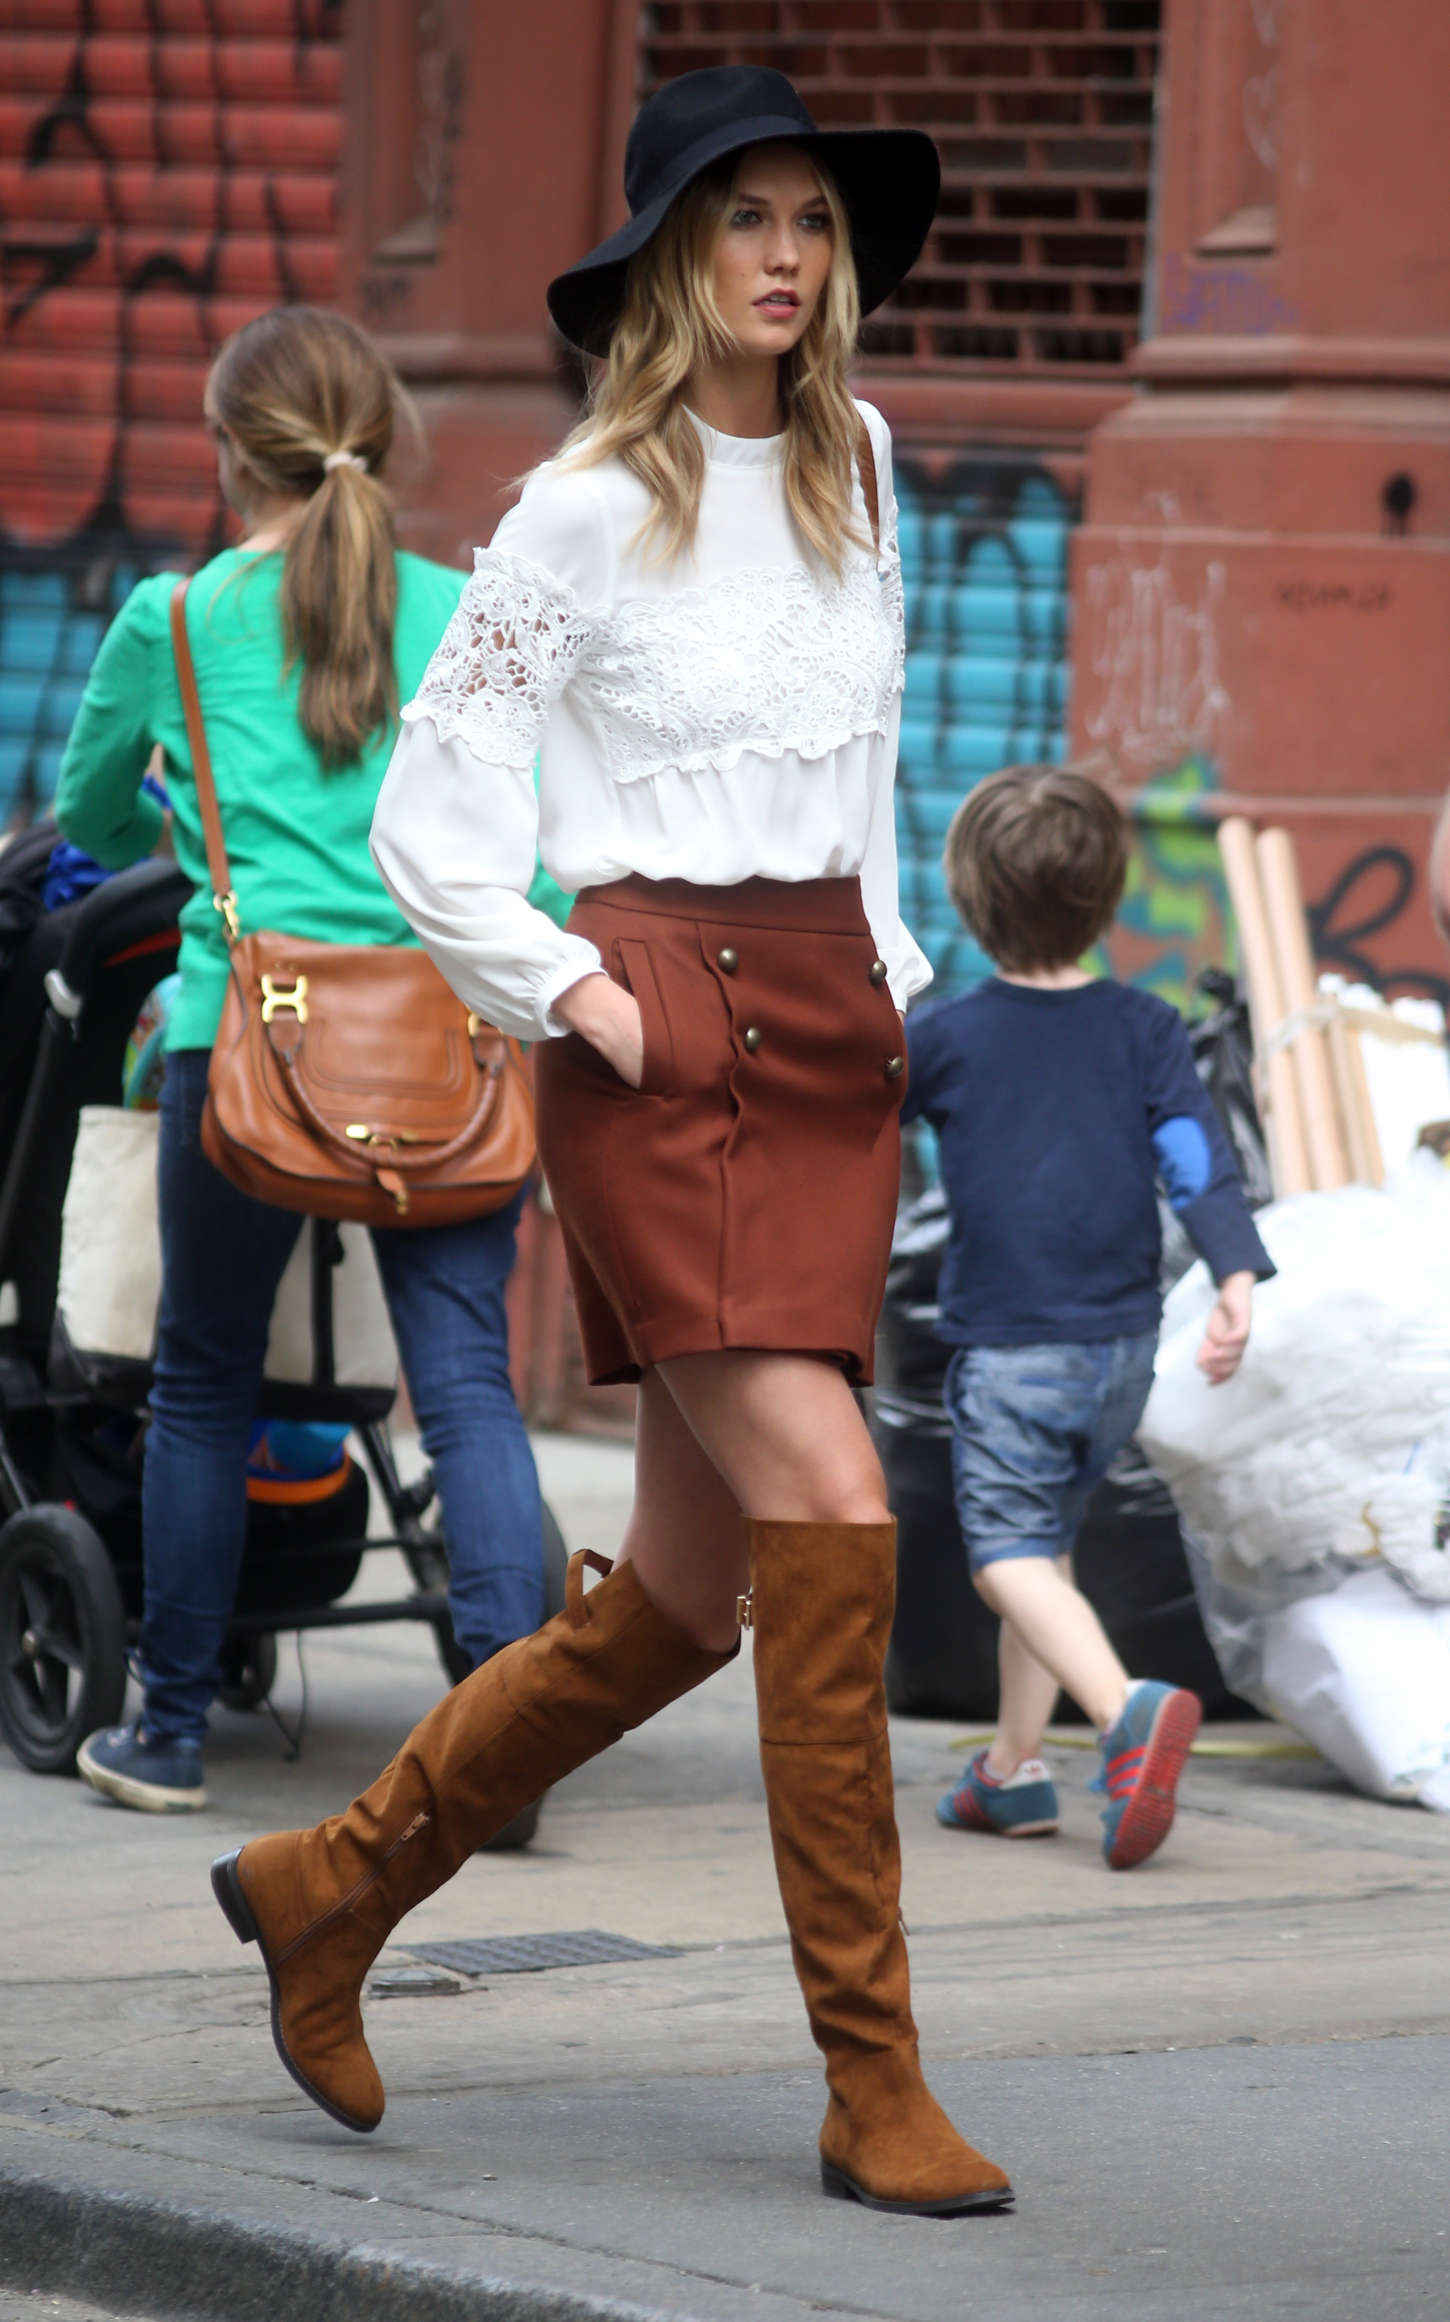 Karlie Kloss 2015 : Karlie Kloss: Photoshoot in NYC -73